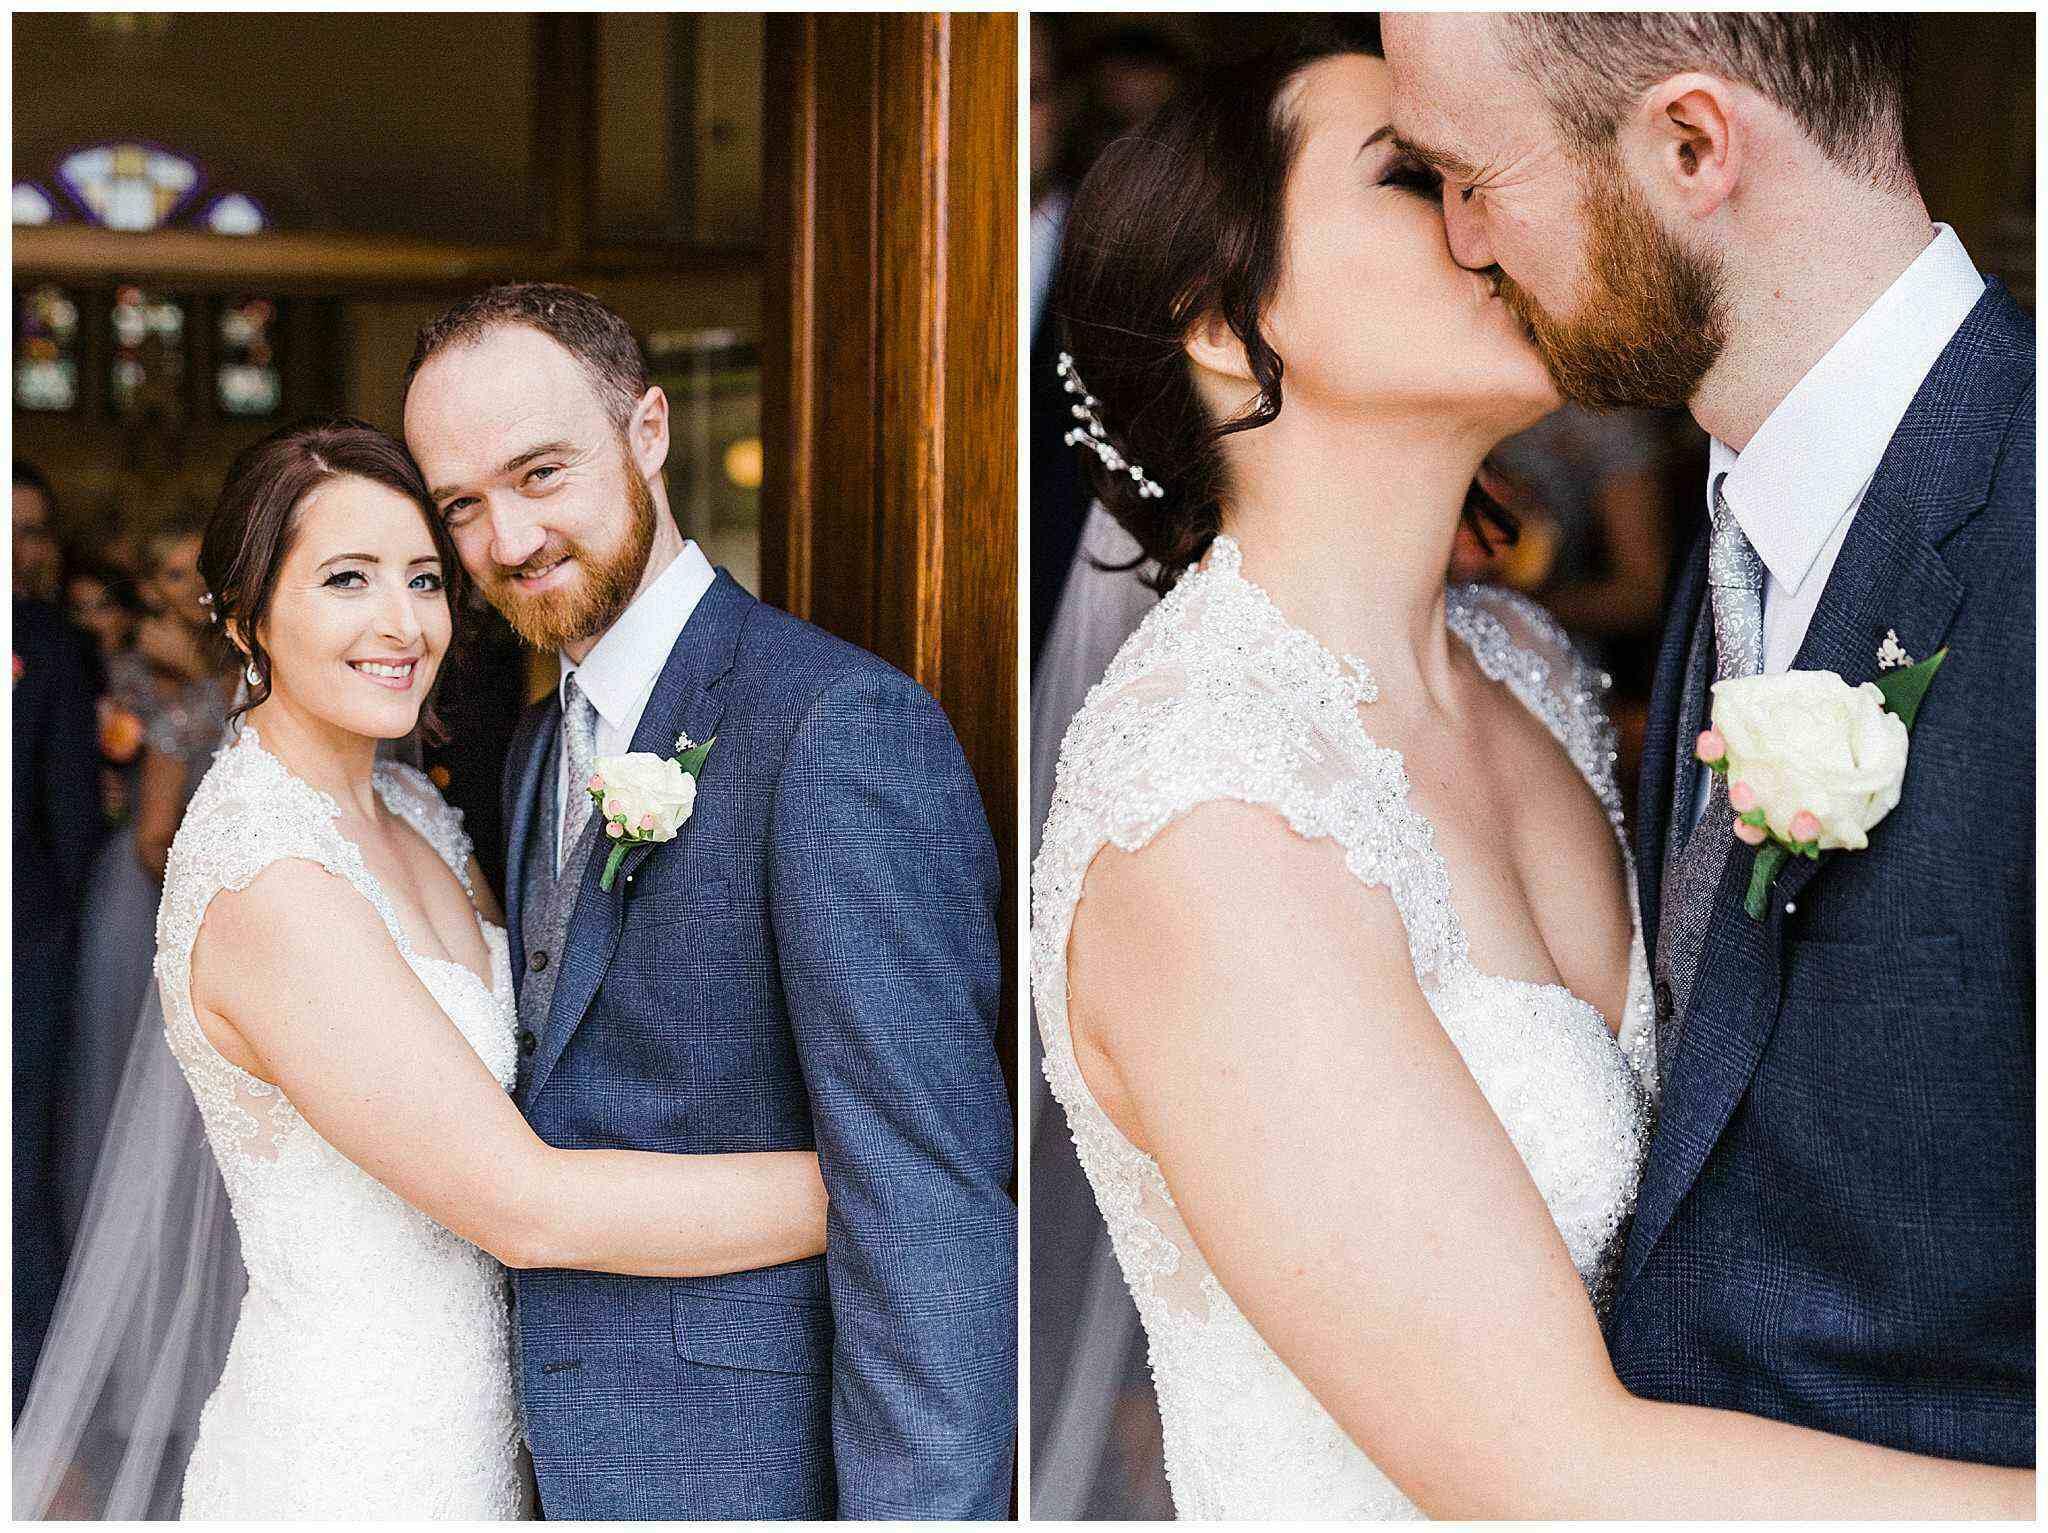 Nicola + Brendan's Wedding at the Millhouse Slane 35